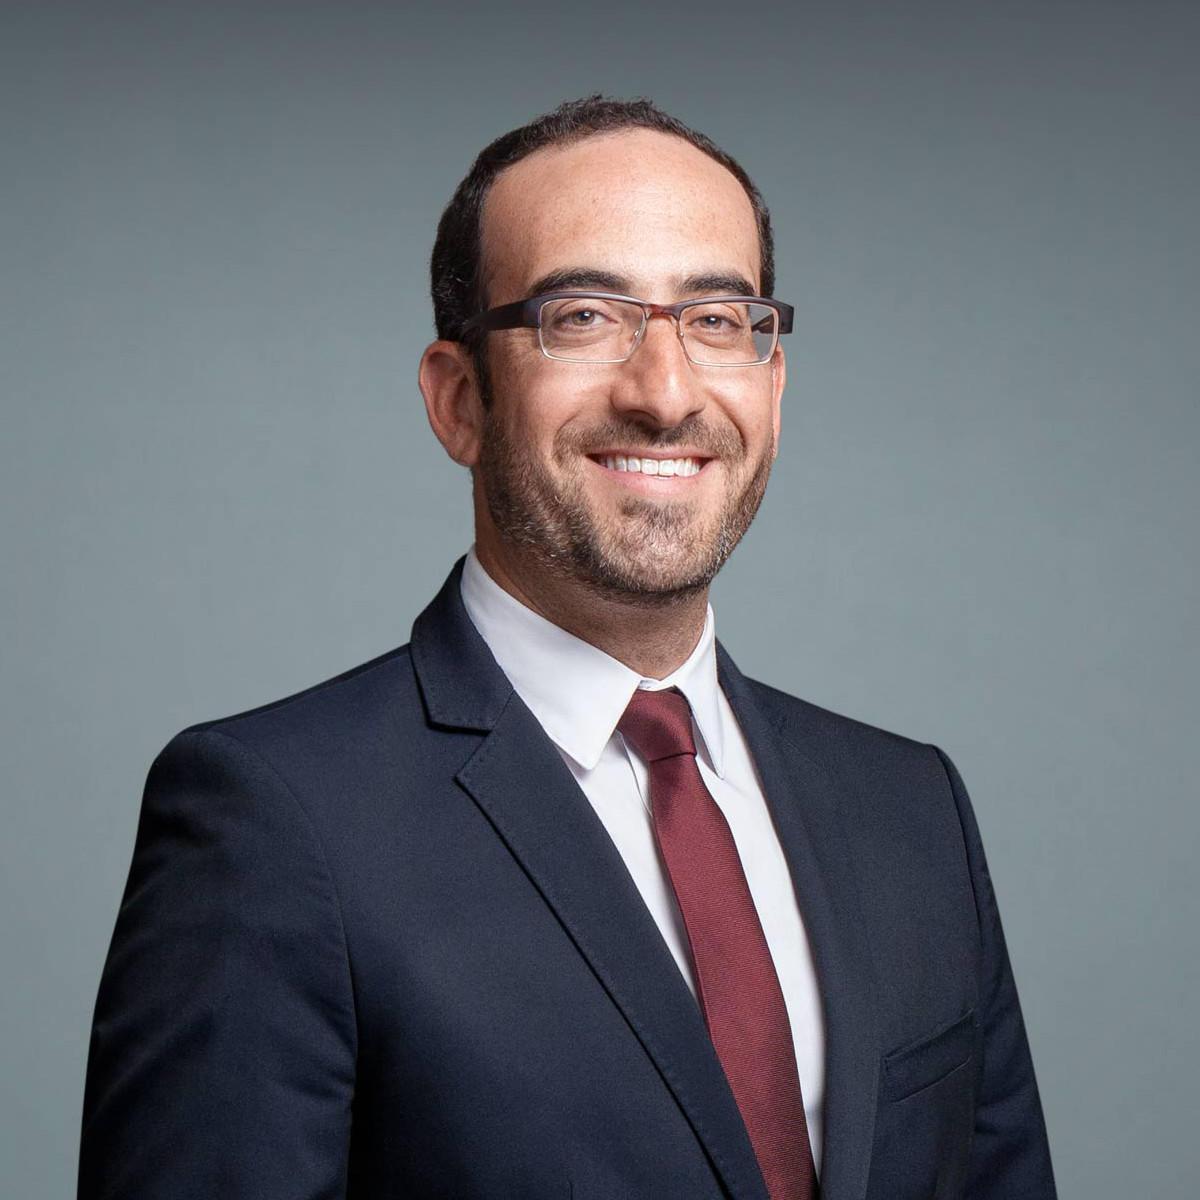 Josef A. Shehebar, MD